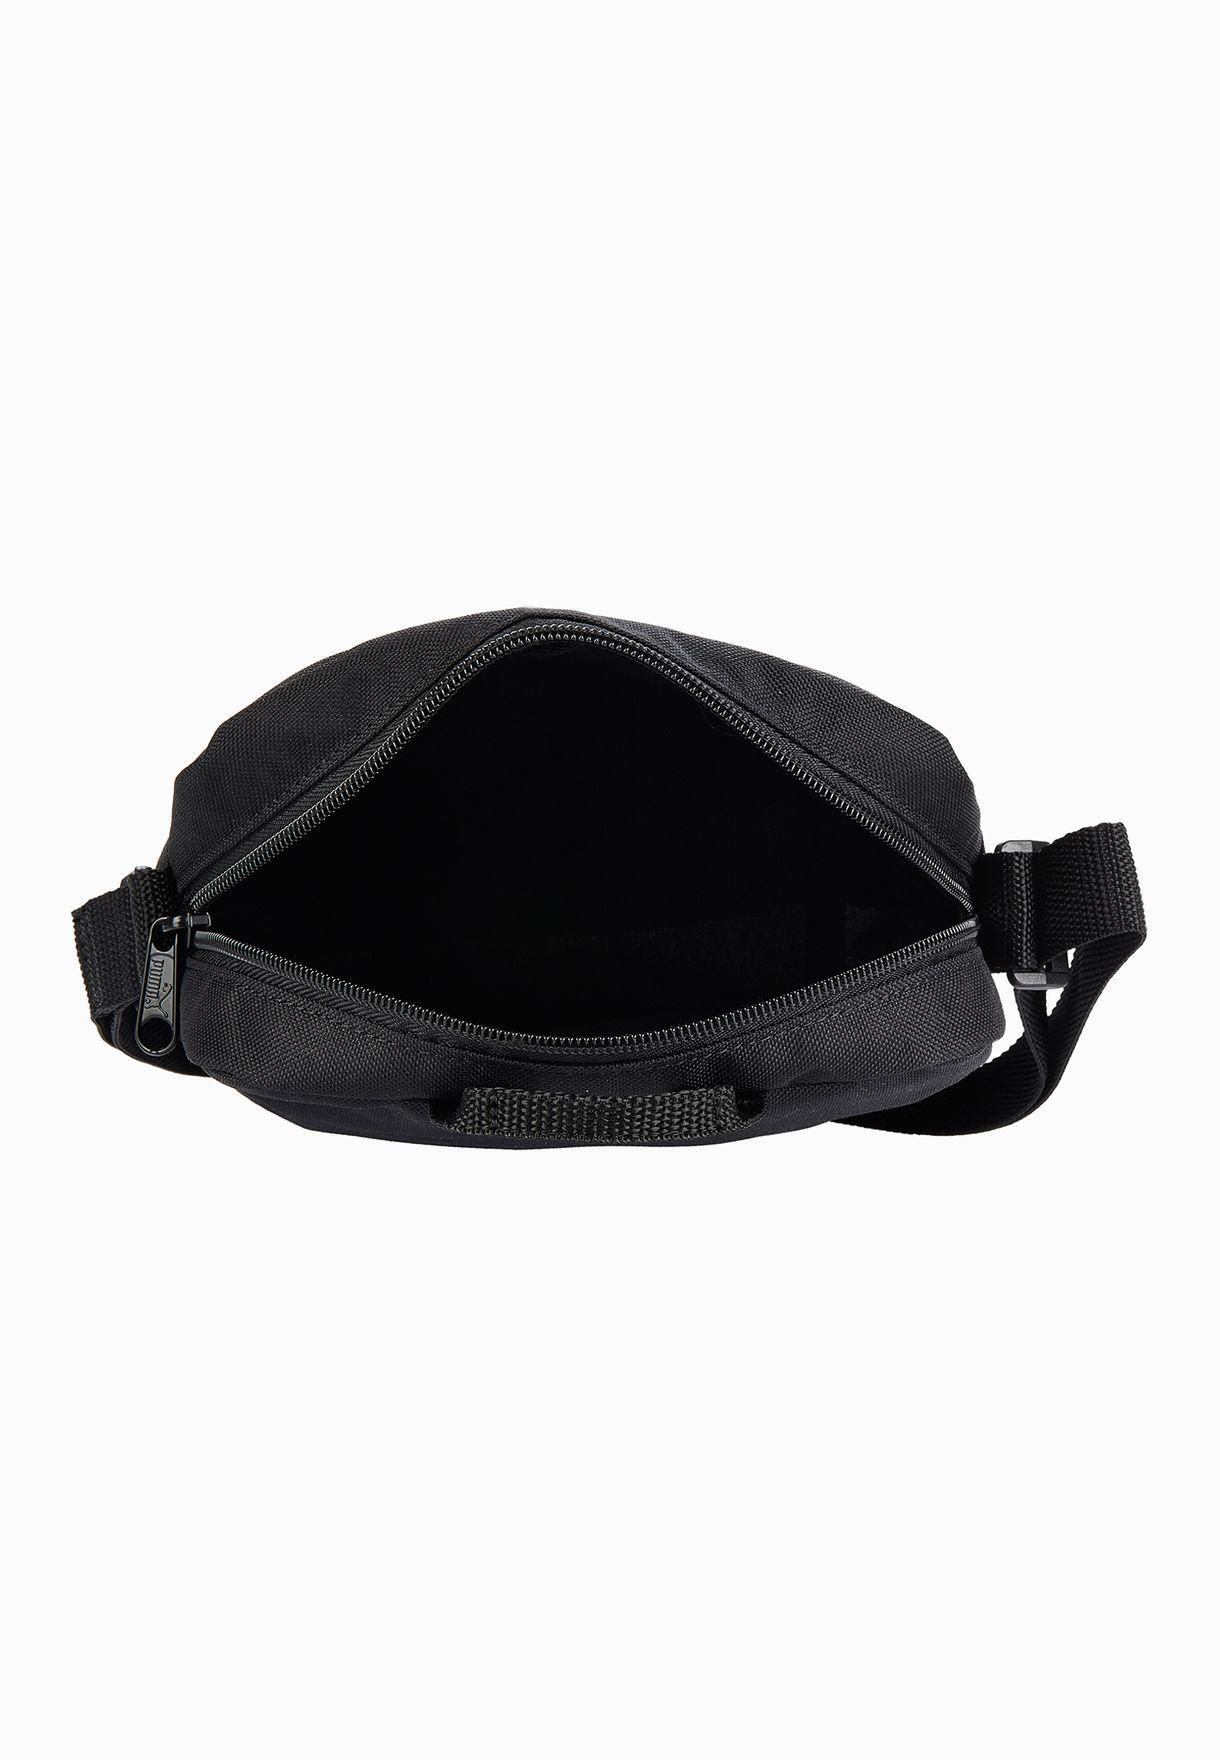 Shop PUMA black Ferrari Fanwear Messenger 07395802 for Men in ... 4c84777c8f4b1